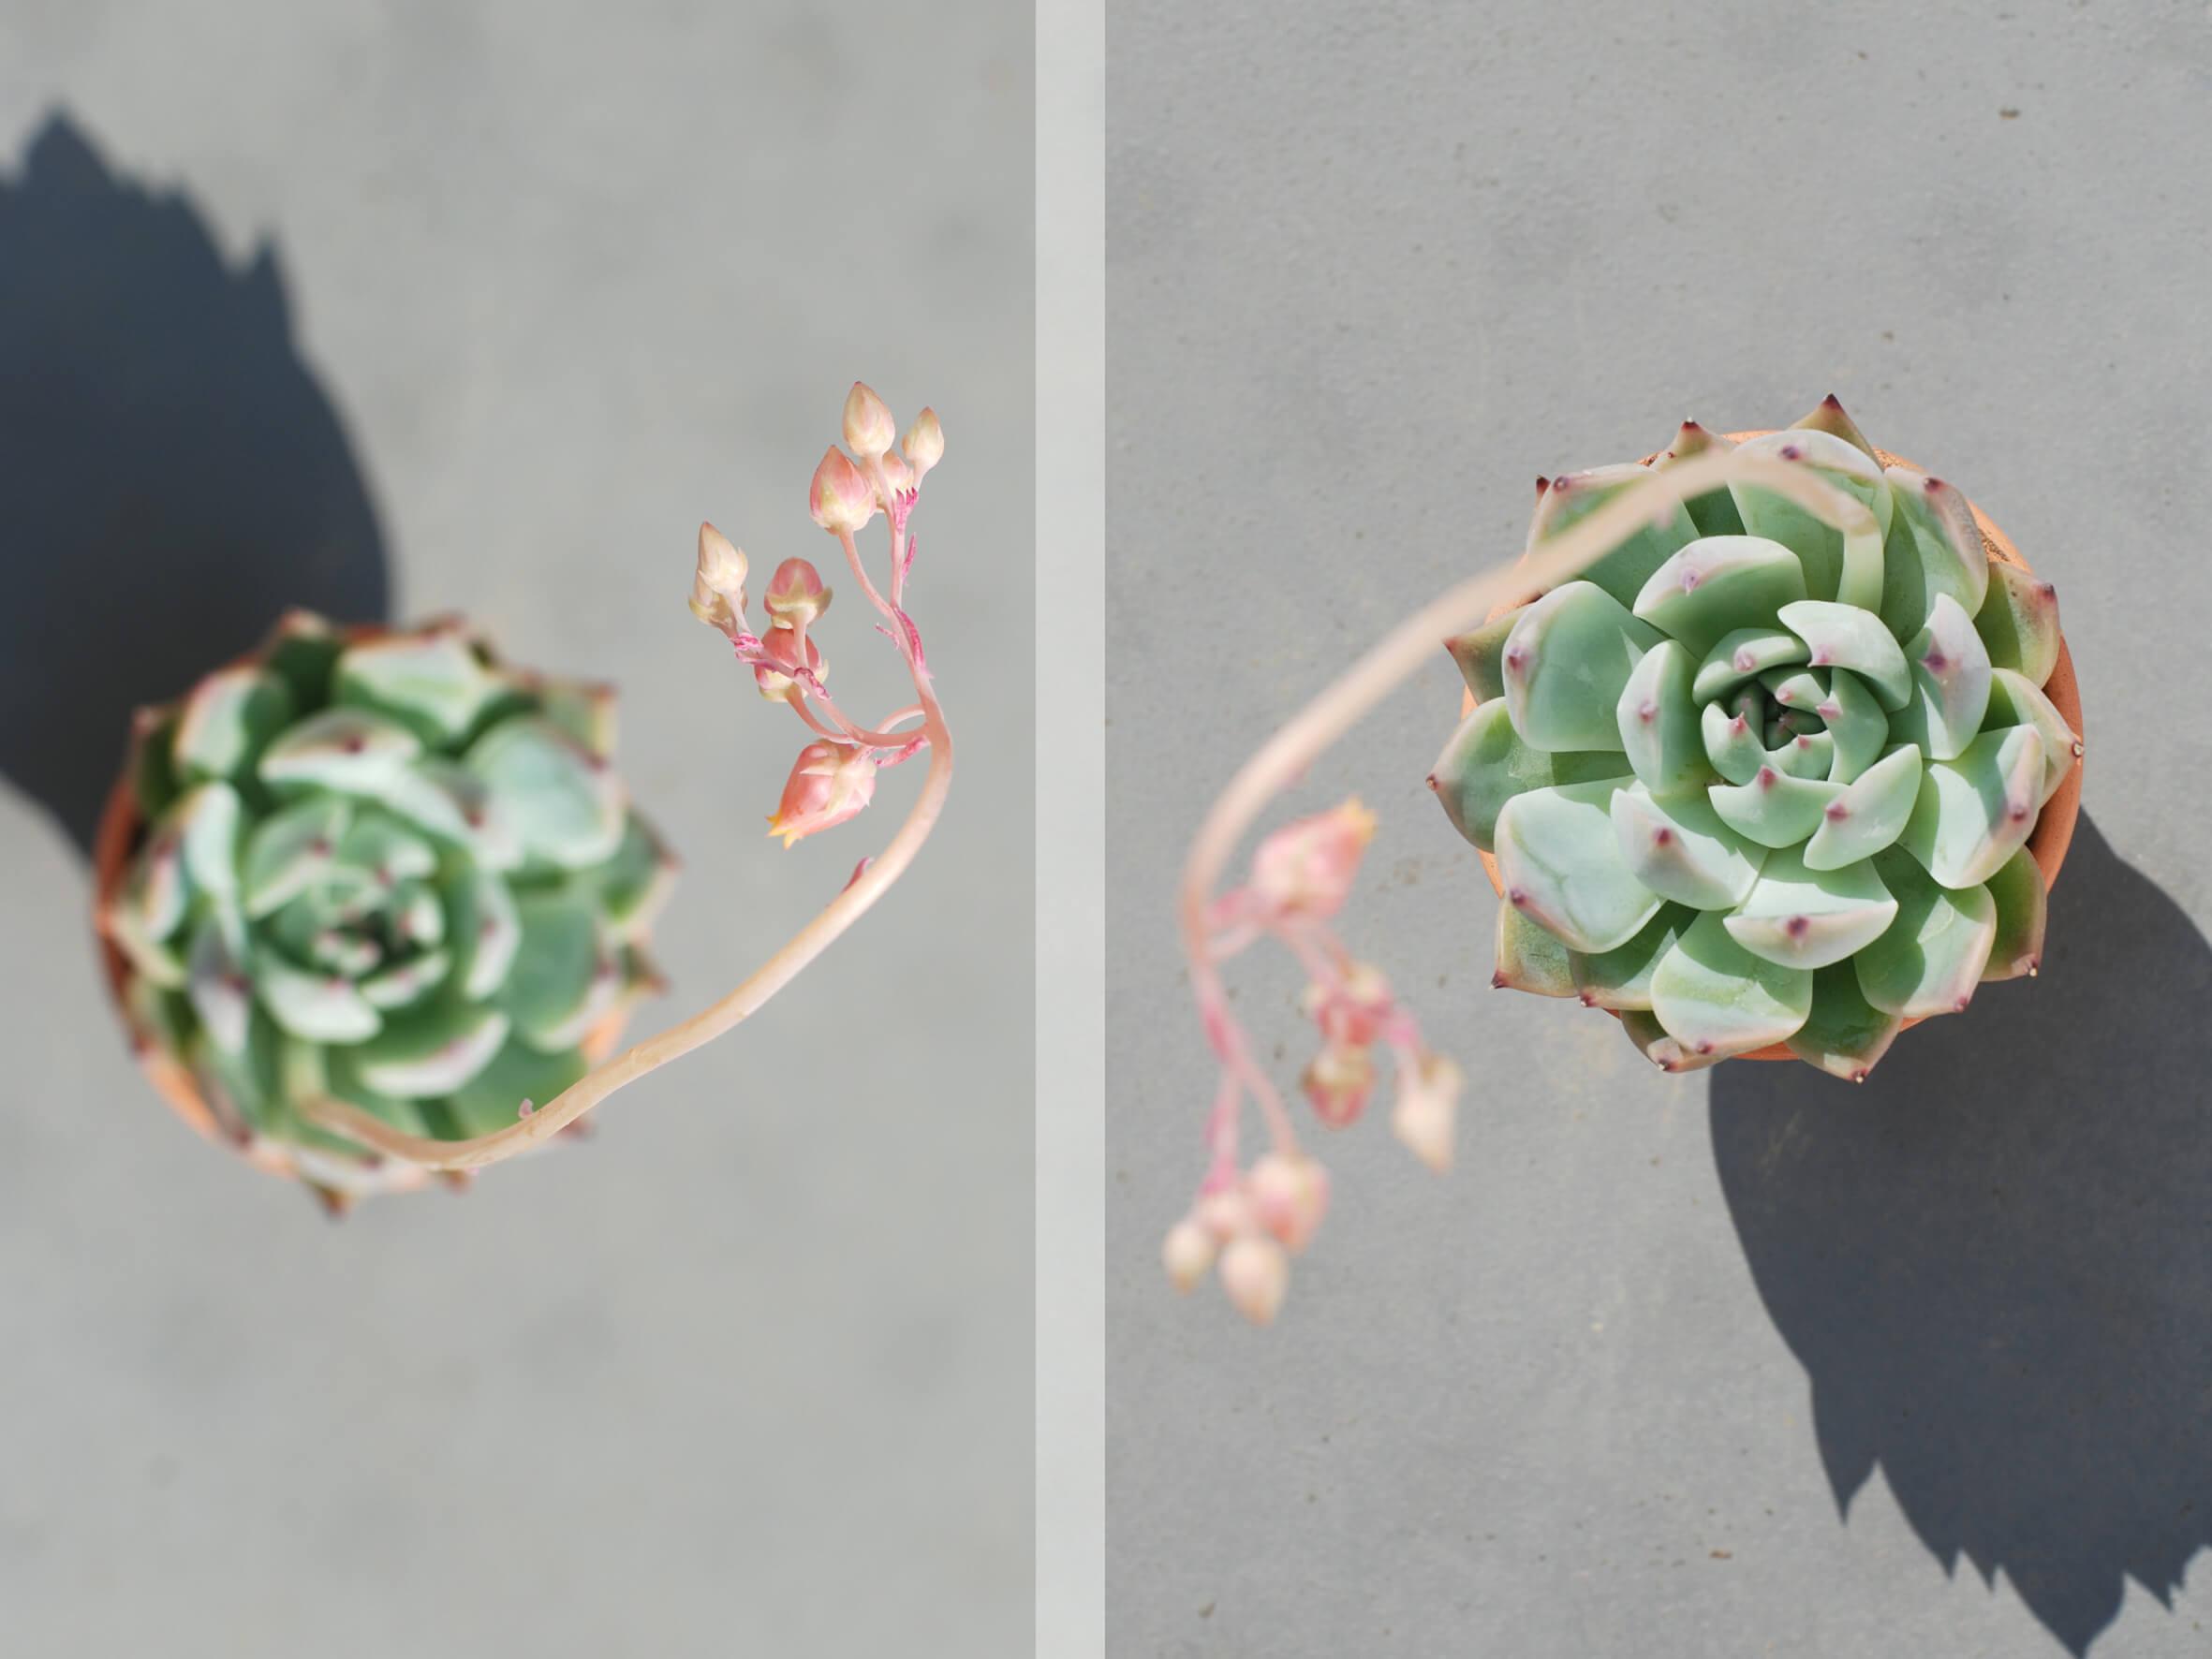 echeveria-chihuahuaensis-01-apr-2020.jpg